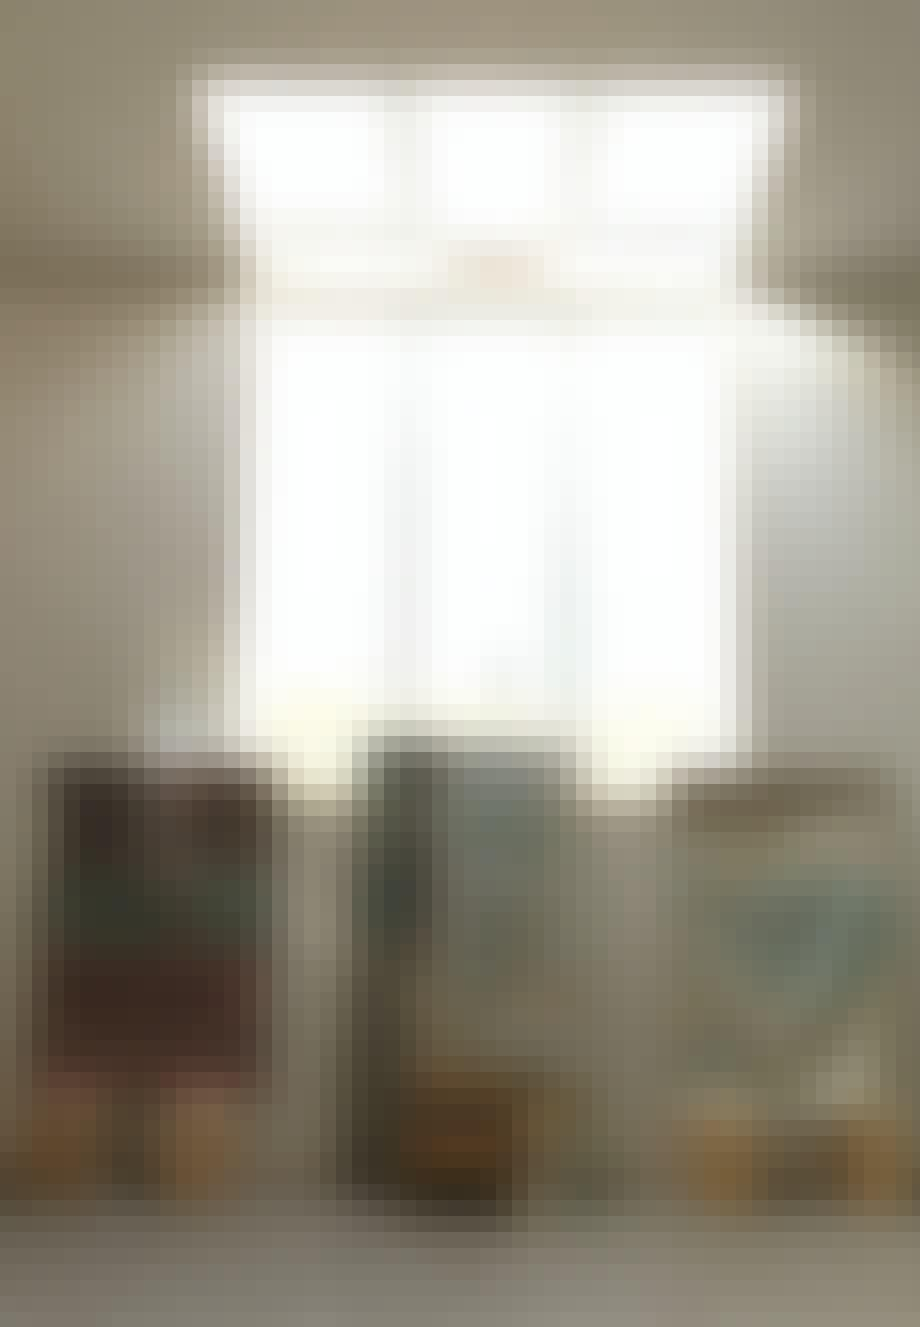 Collager opstillet under store vinduer og ovenlysvinduer